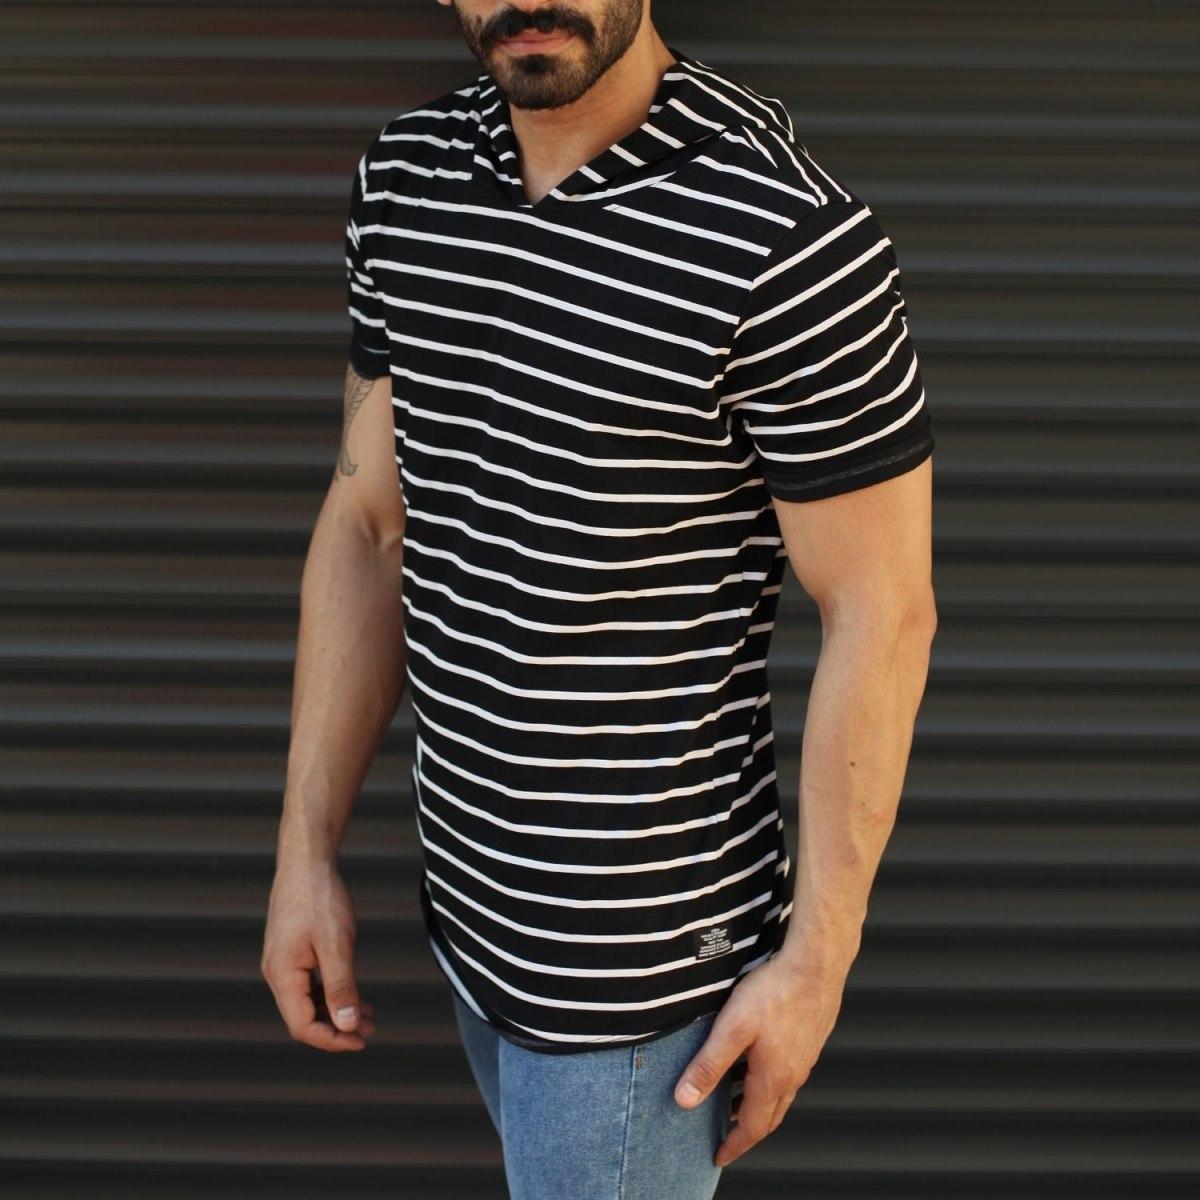 Men's Hooded Longline Striped T-Shirt Black Mv Premium Brand - 2